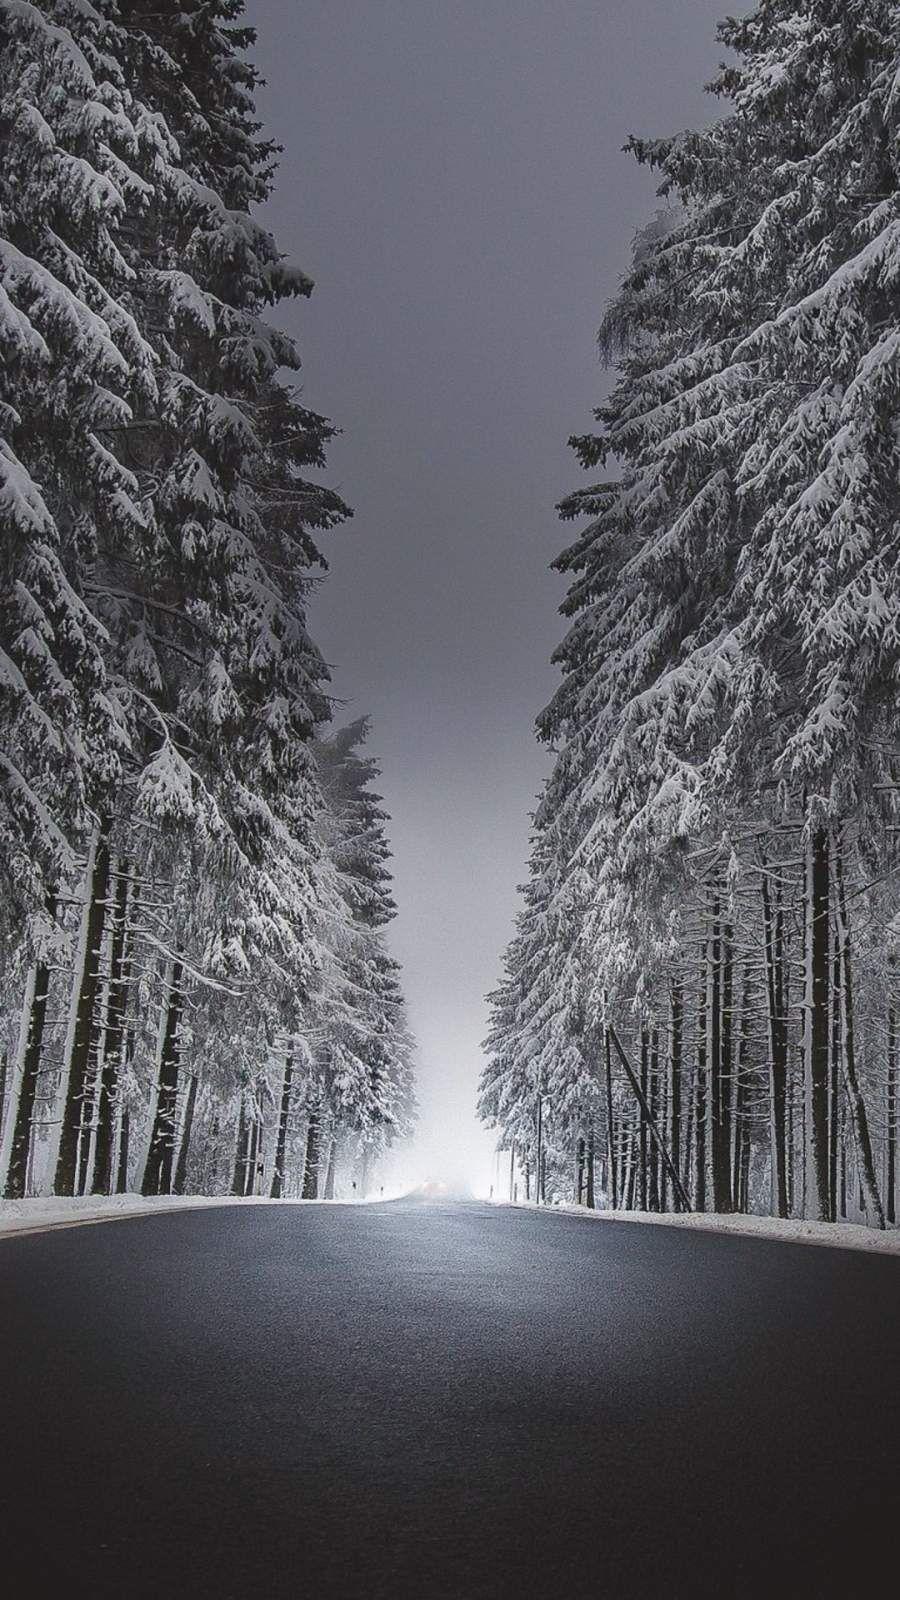 Winter Road Asphalt Snow Iphone Wallpaper Iphone Wallpaper Images Iphone Wallpaper Wallpaper Hd wallpaper snow winter road asphalt